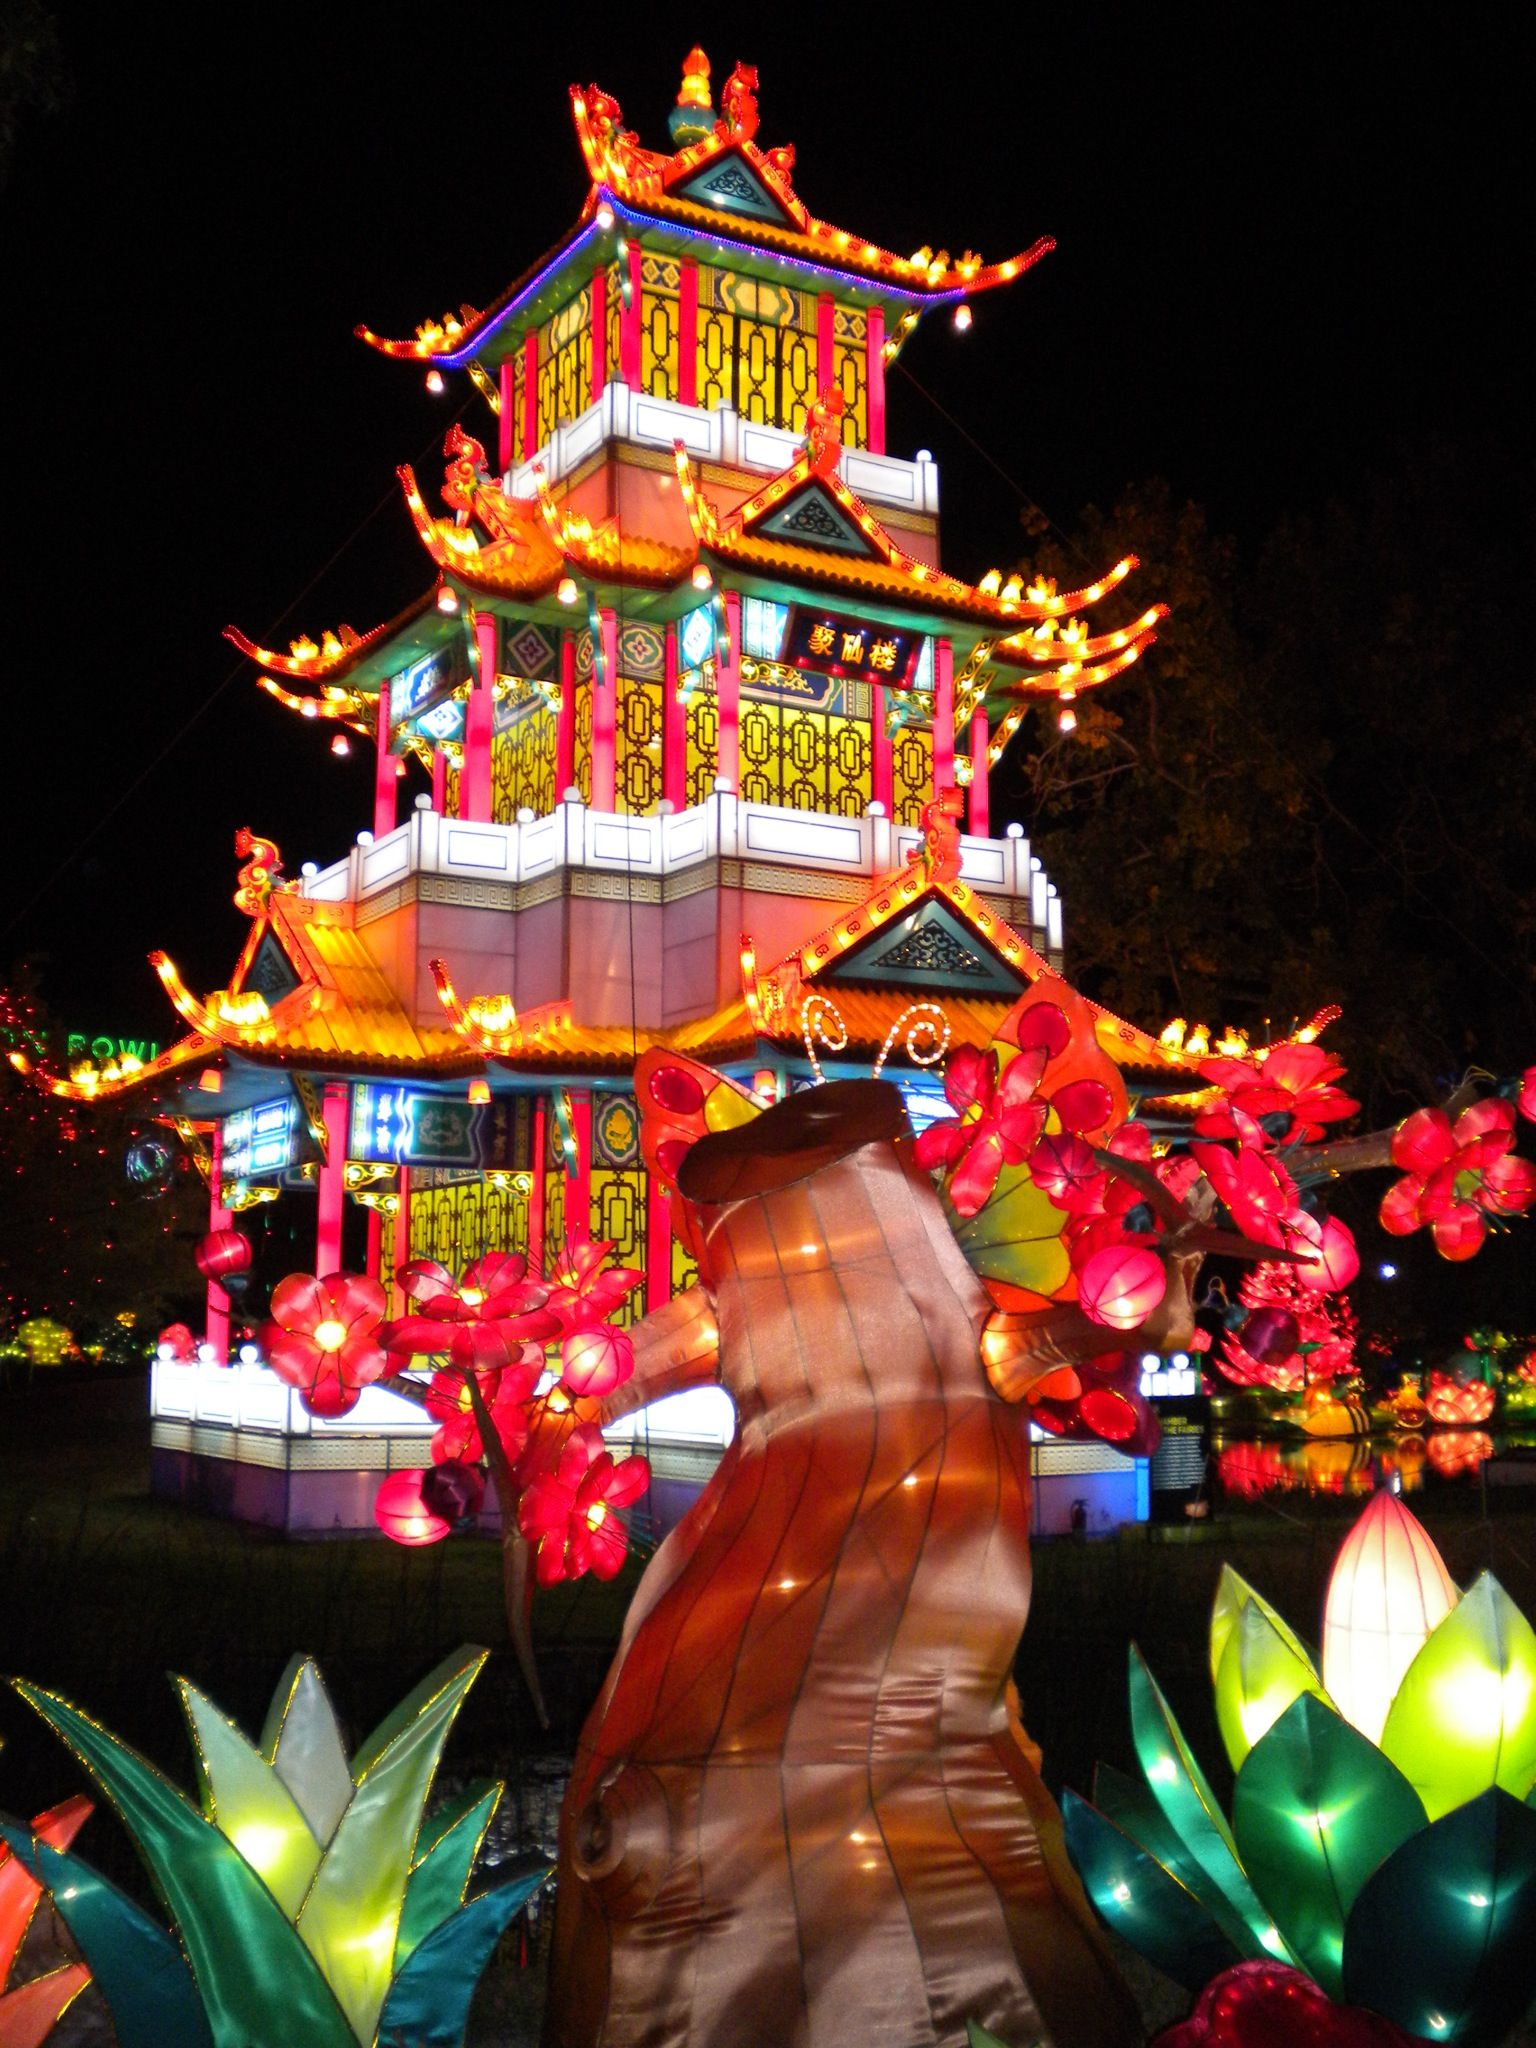 Dallas Chinese Lantern Festival 2012 Chinese lantern